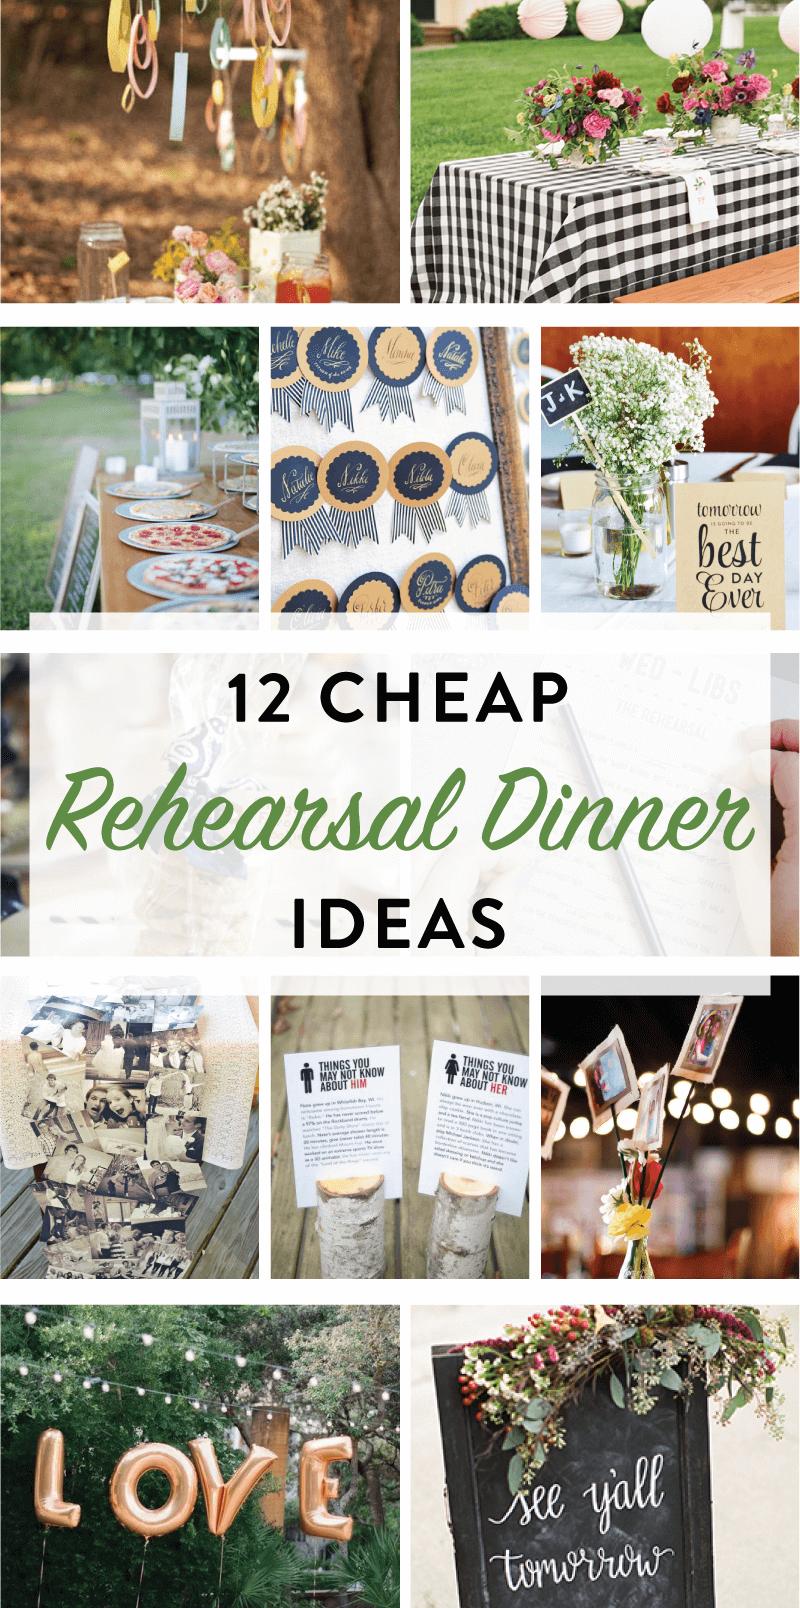 12 Cheap Rehearsal Dinner Ideas | Wedding rehearsal dinner decorations, Rehearsal  dinner decorations, Bbq rehearsal dinner